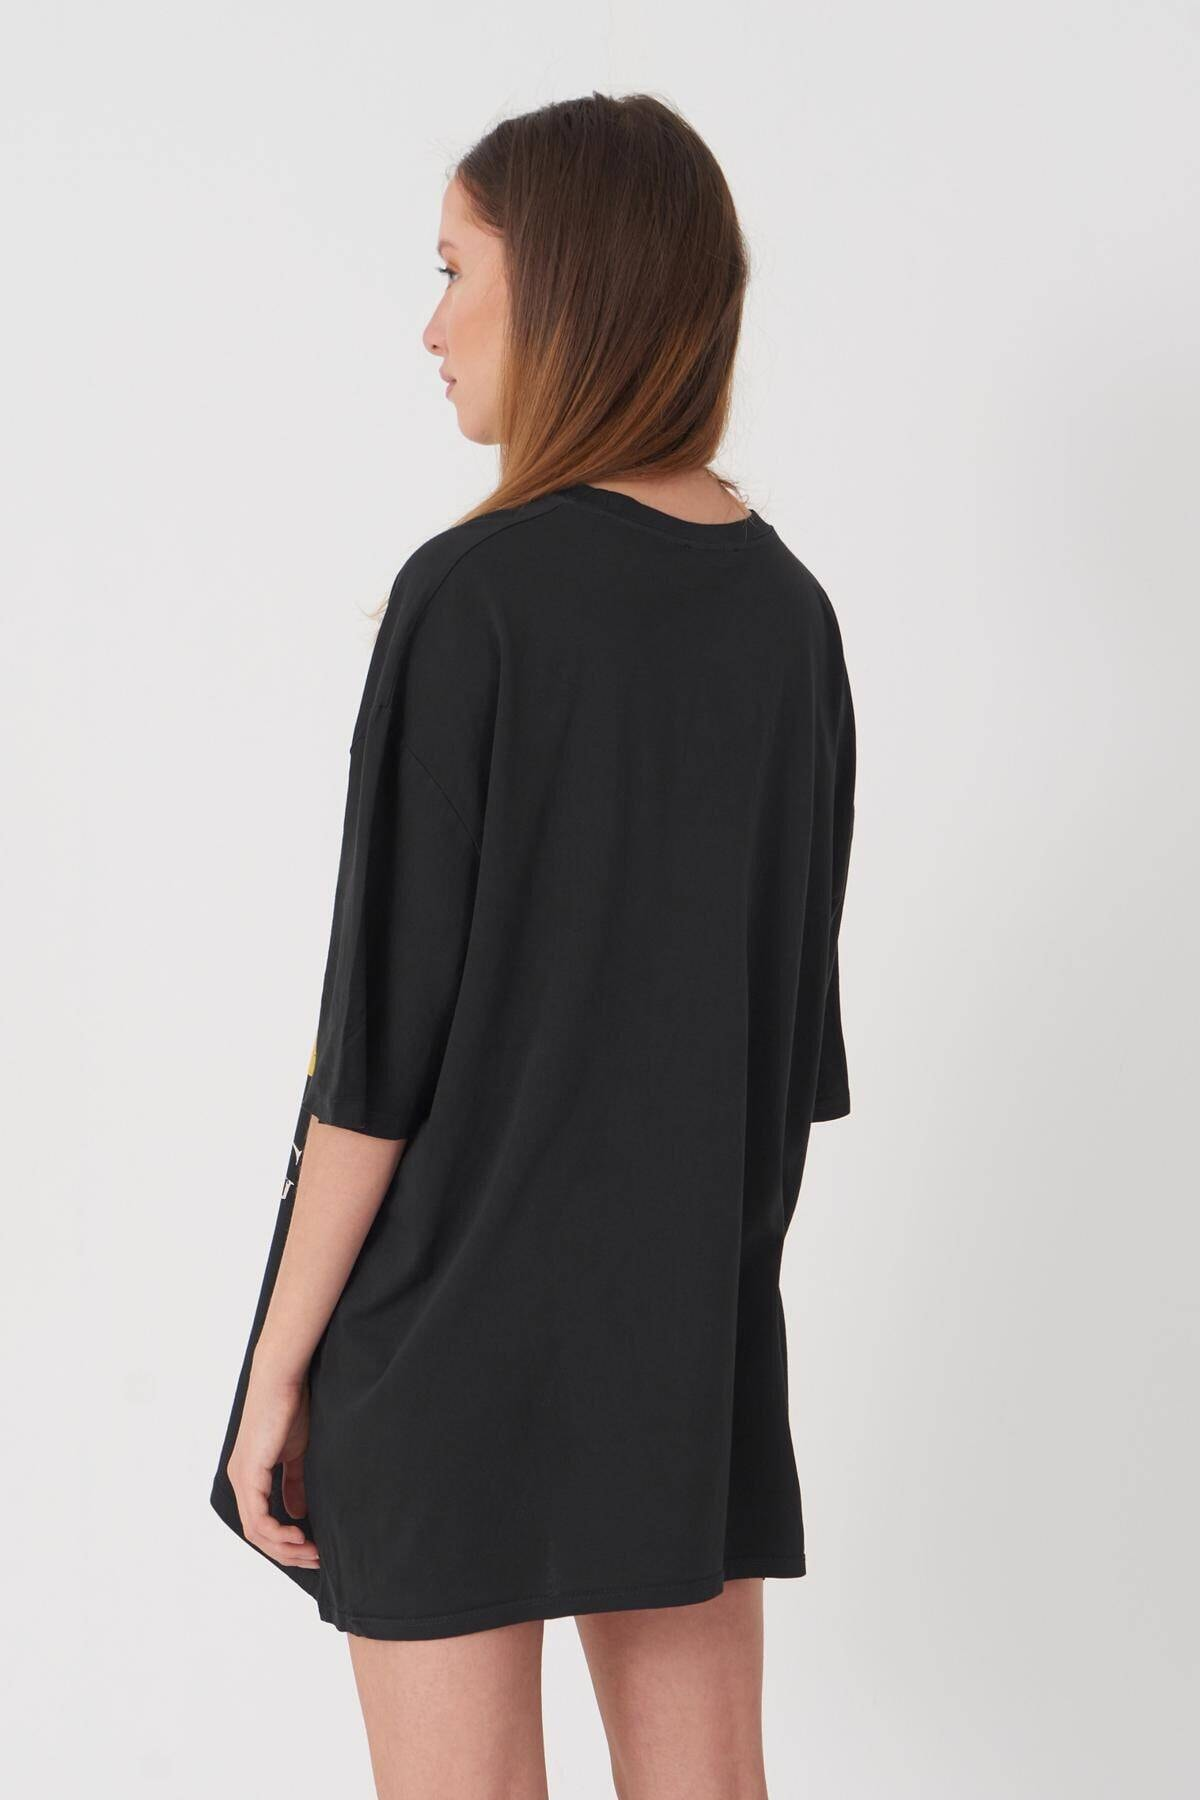 Addax Kadın Füme Baskılı T-Shirt P9365 - D10 Adx-0000021401 4